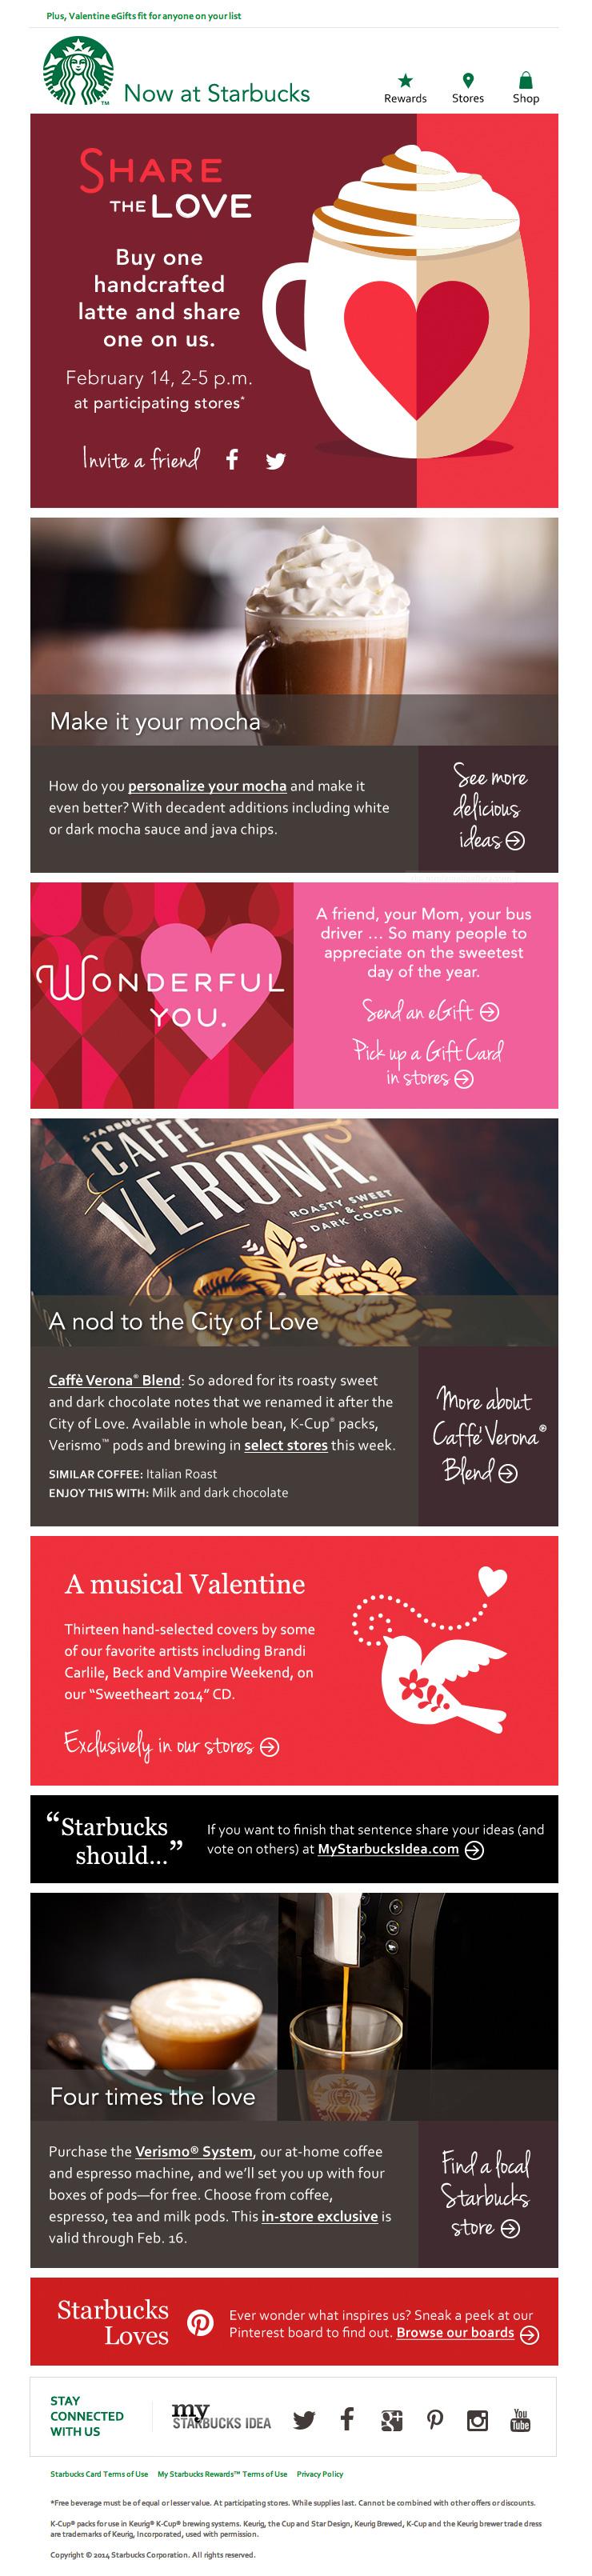 Starbucks Valentines Heart email